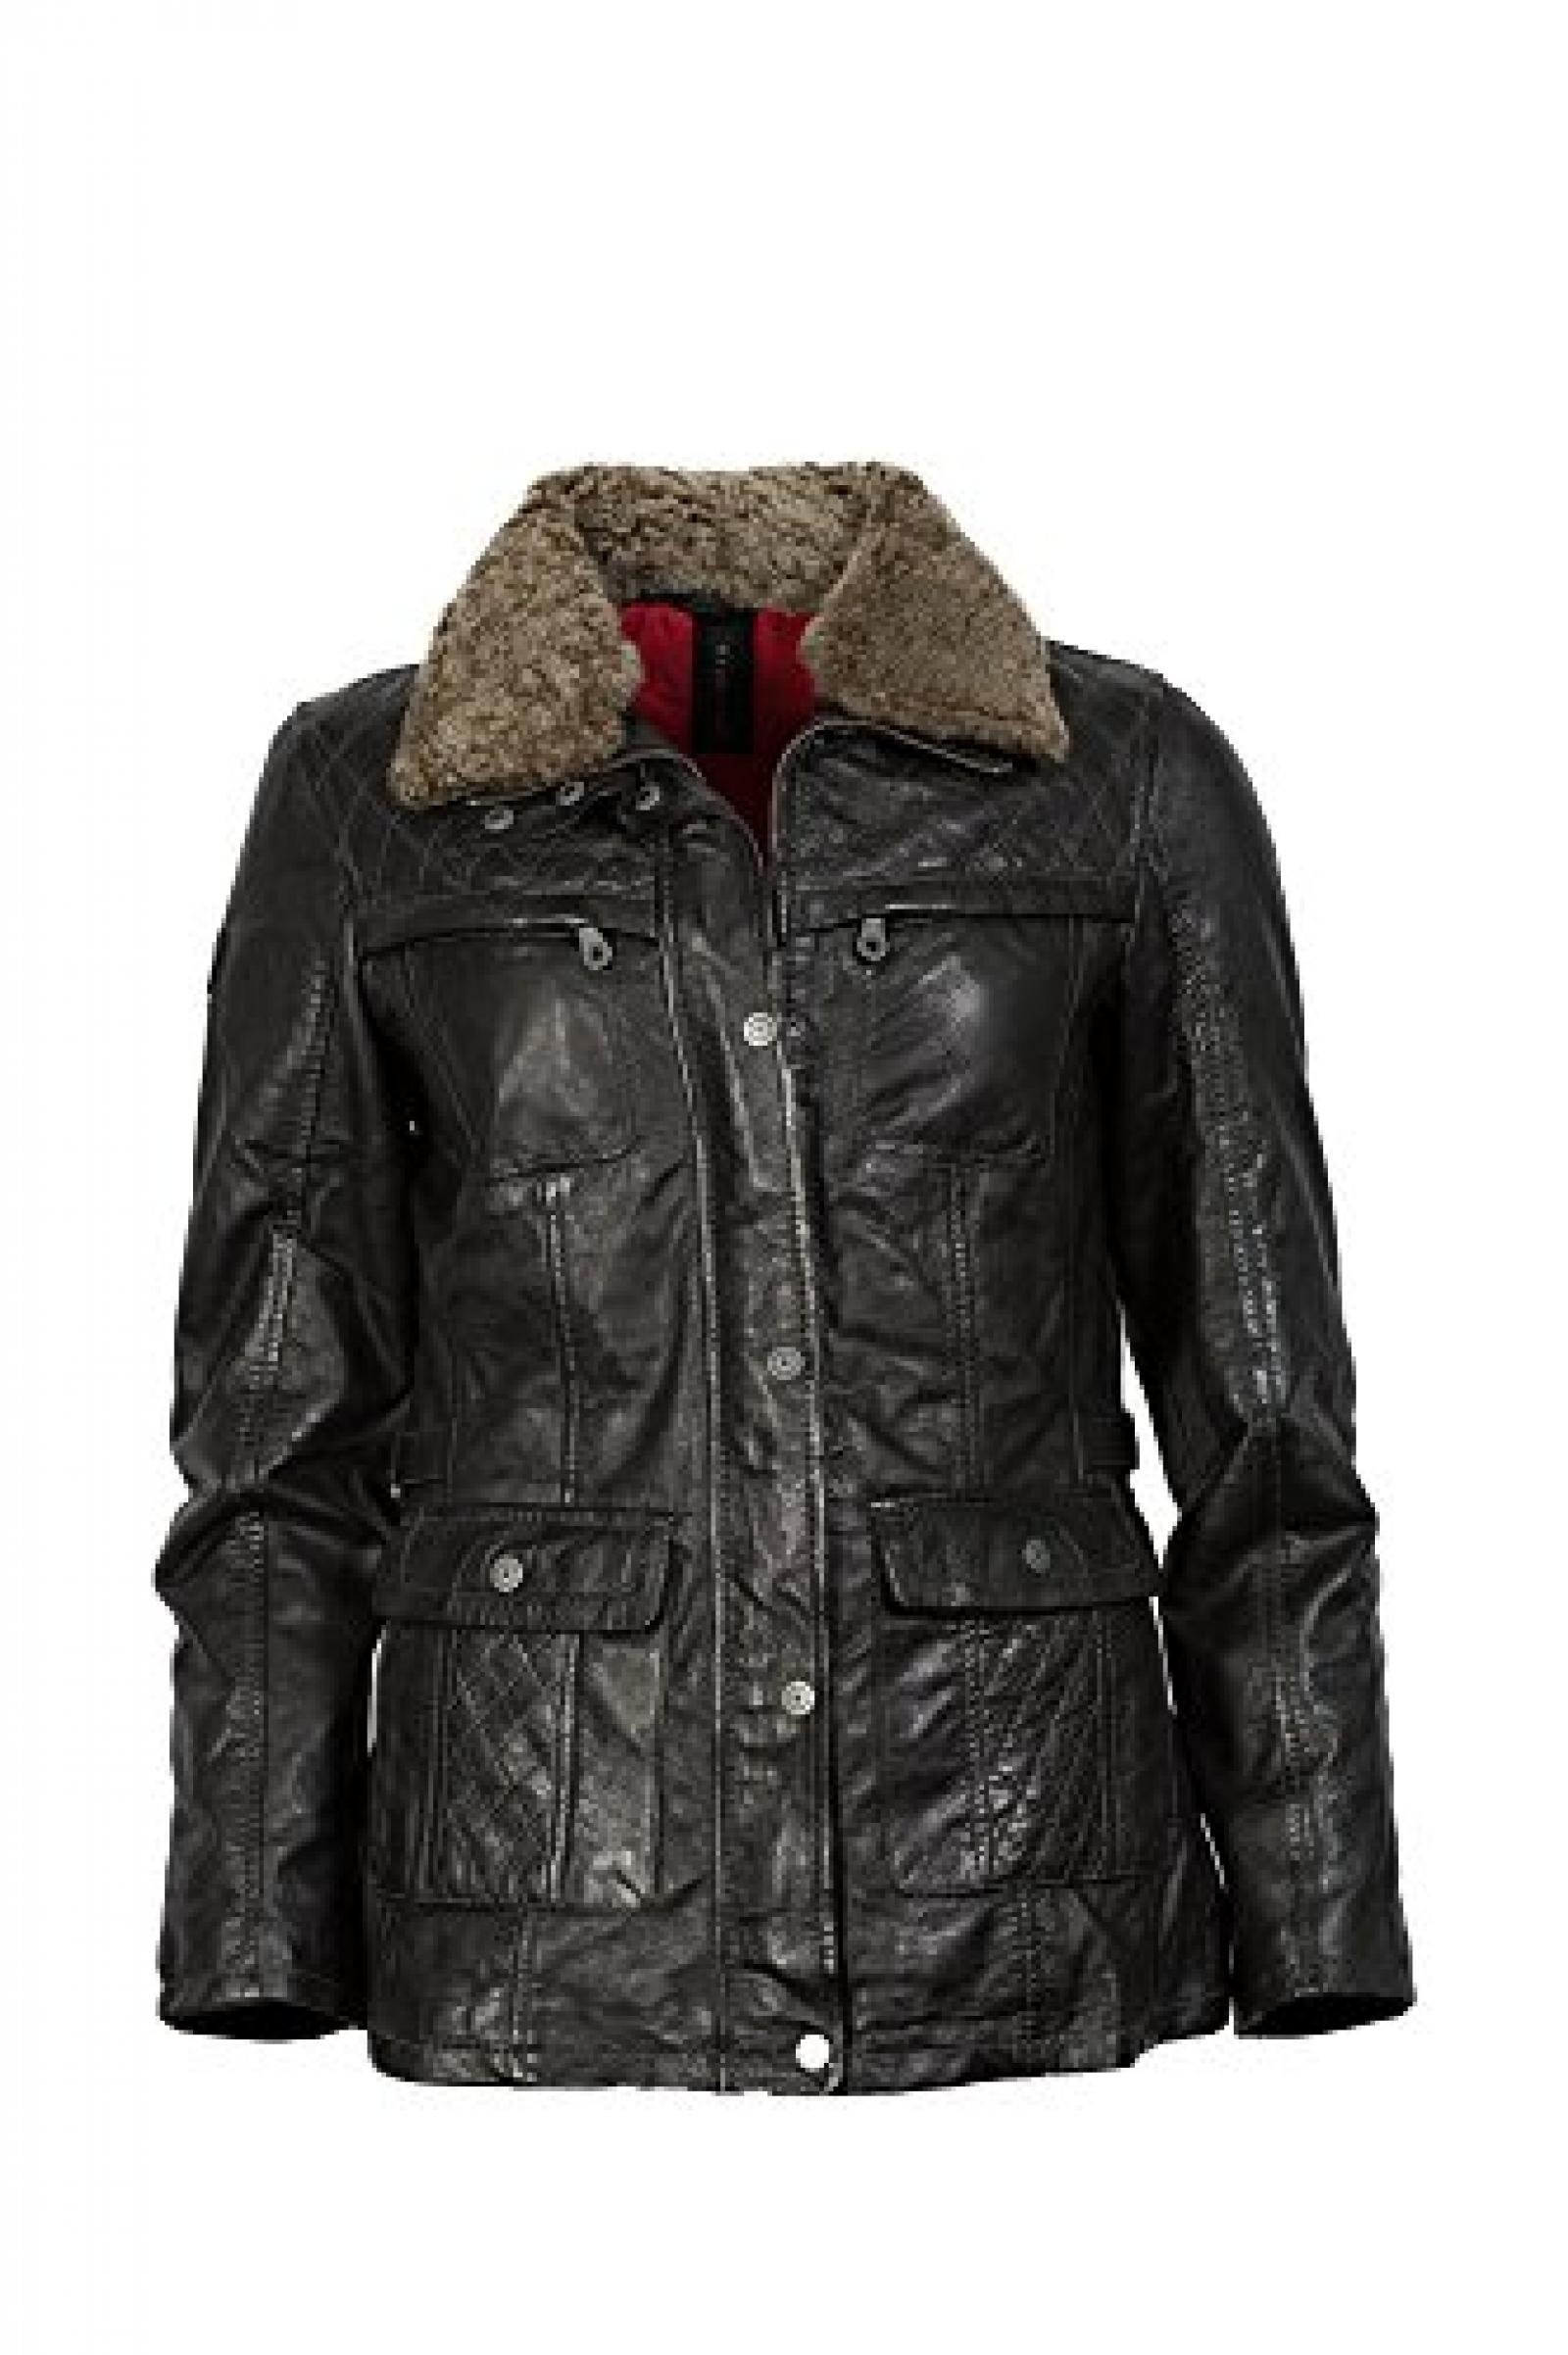 Stilvolle Lederjacke schwarz vom Lifestylelabel Mauritius!